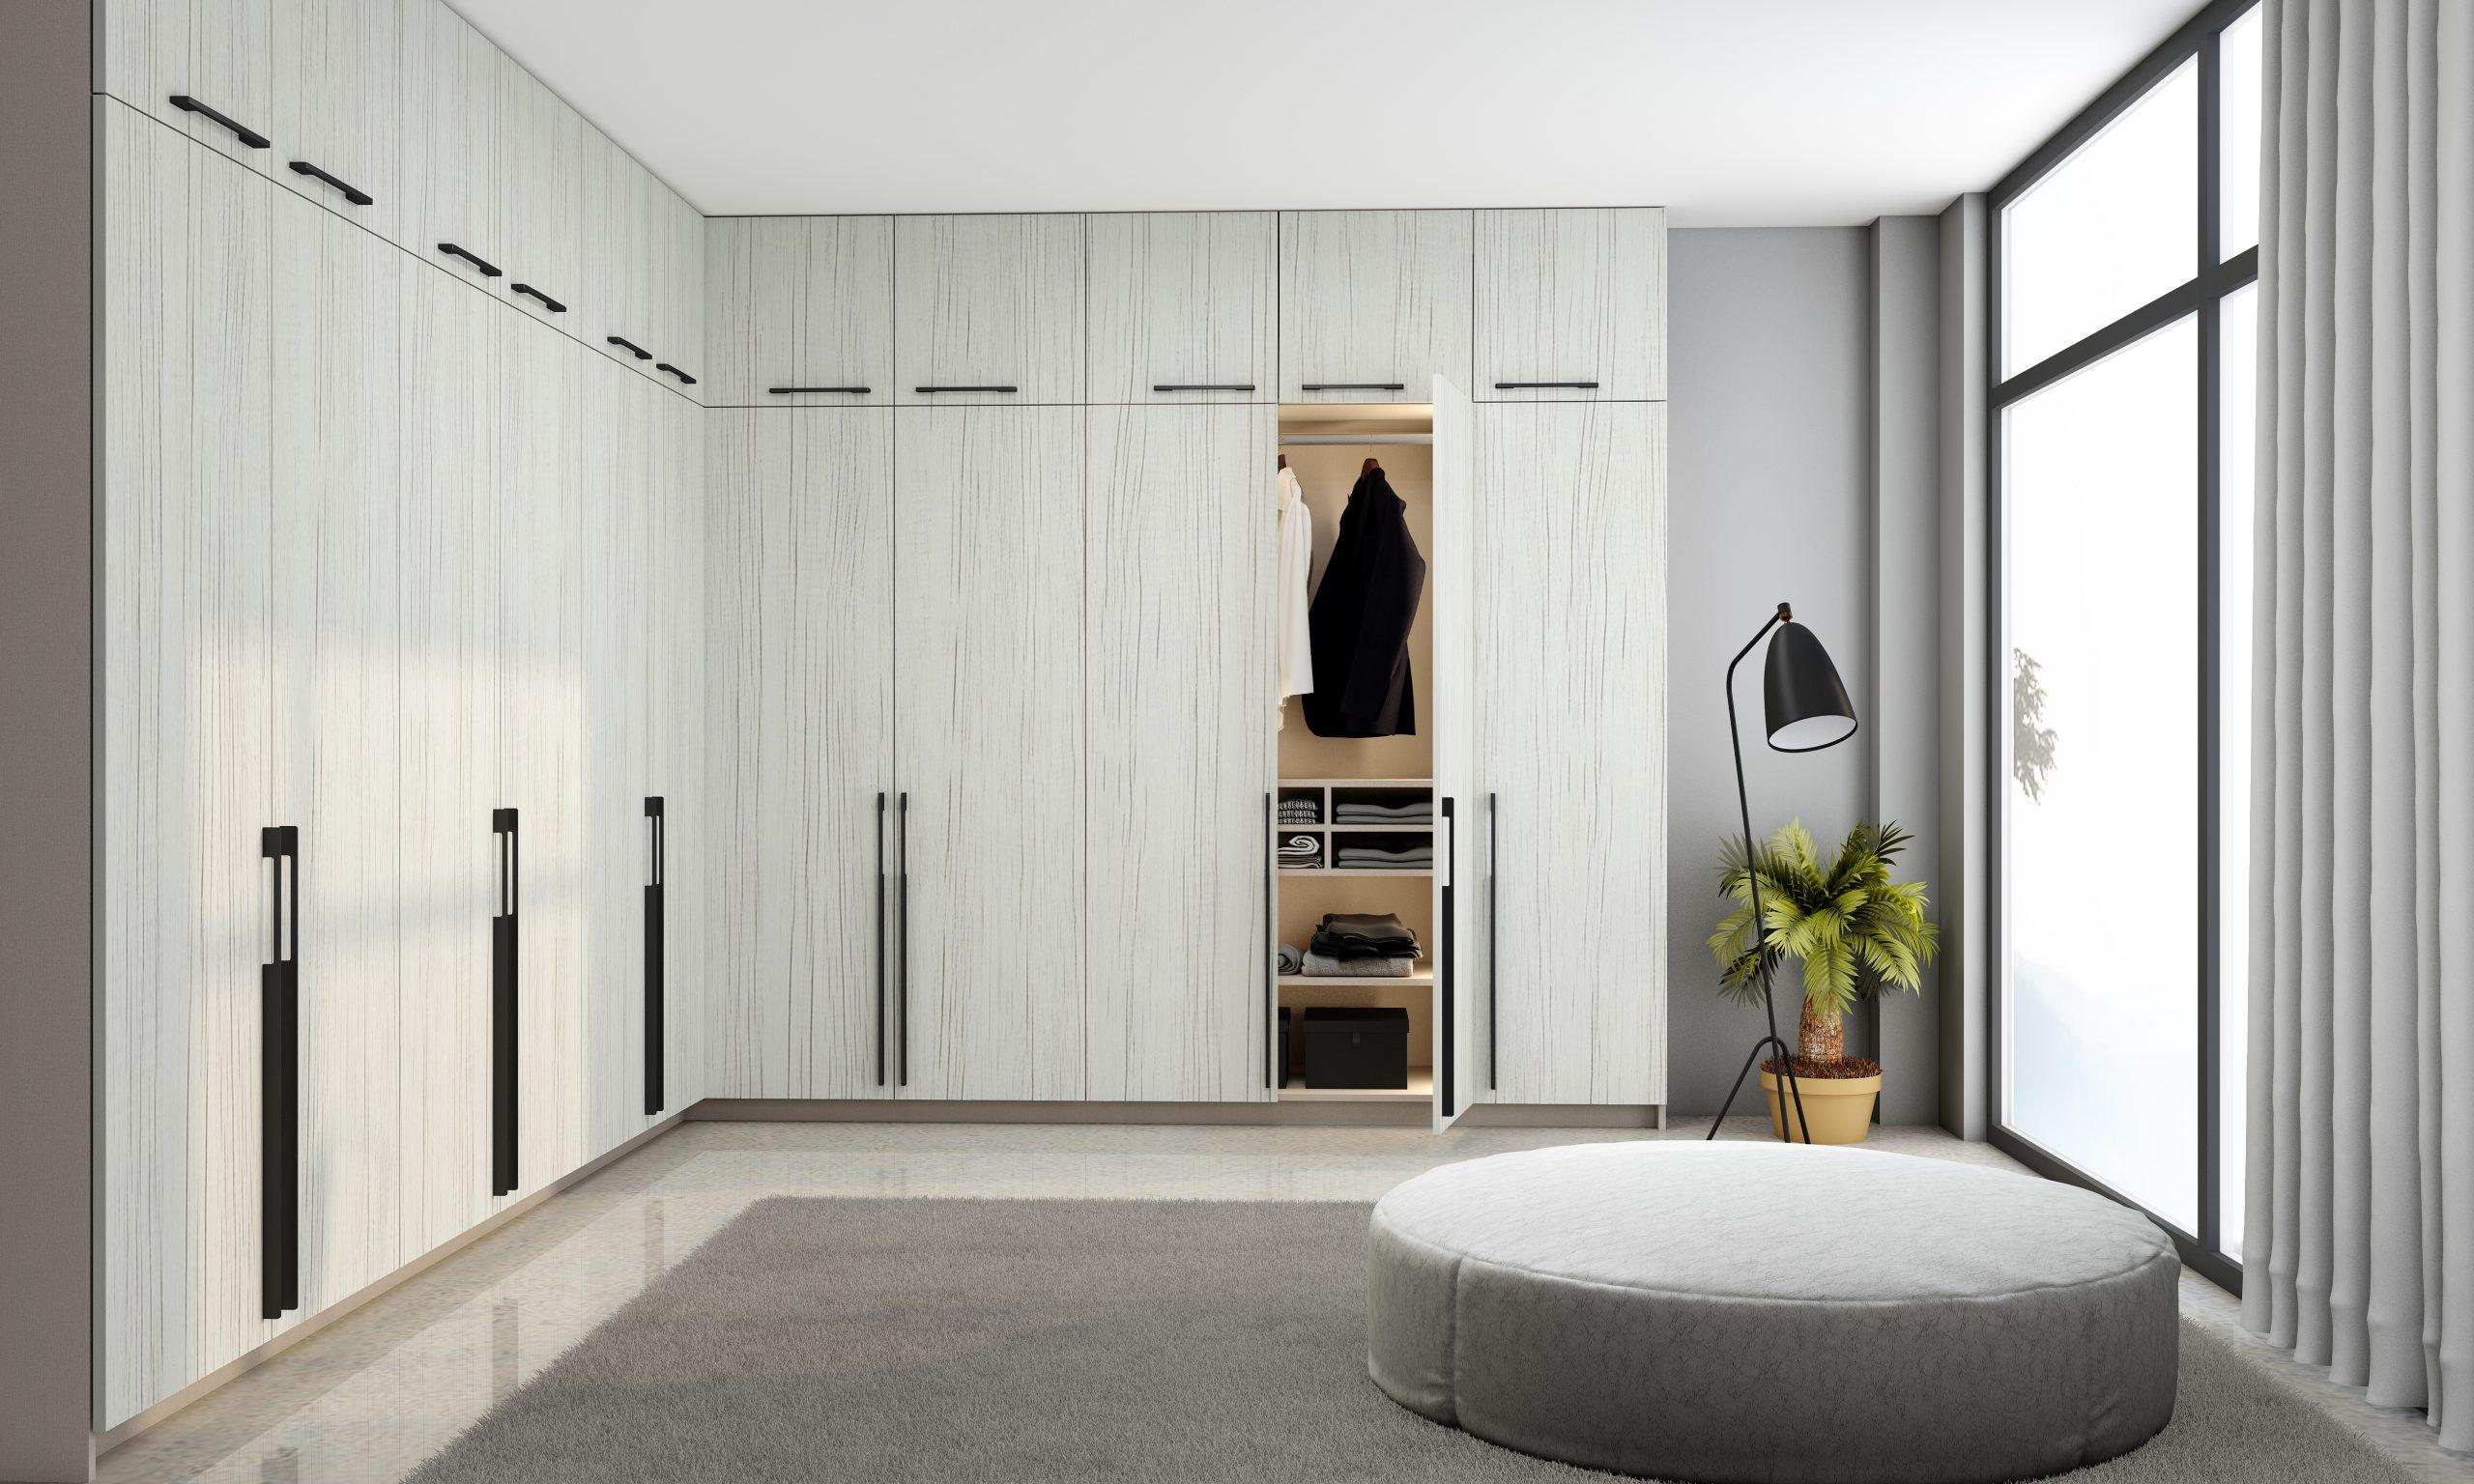 Fitted Hinged Corner Wardrobes in white woodgrain finish